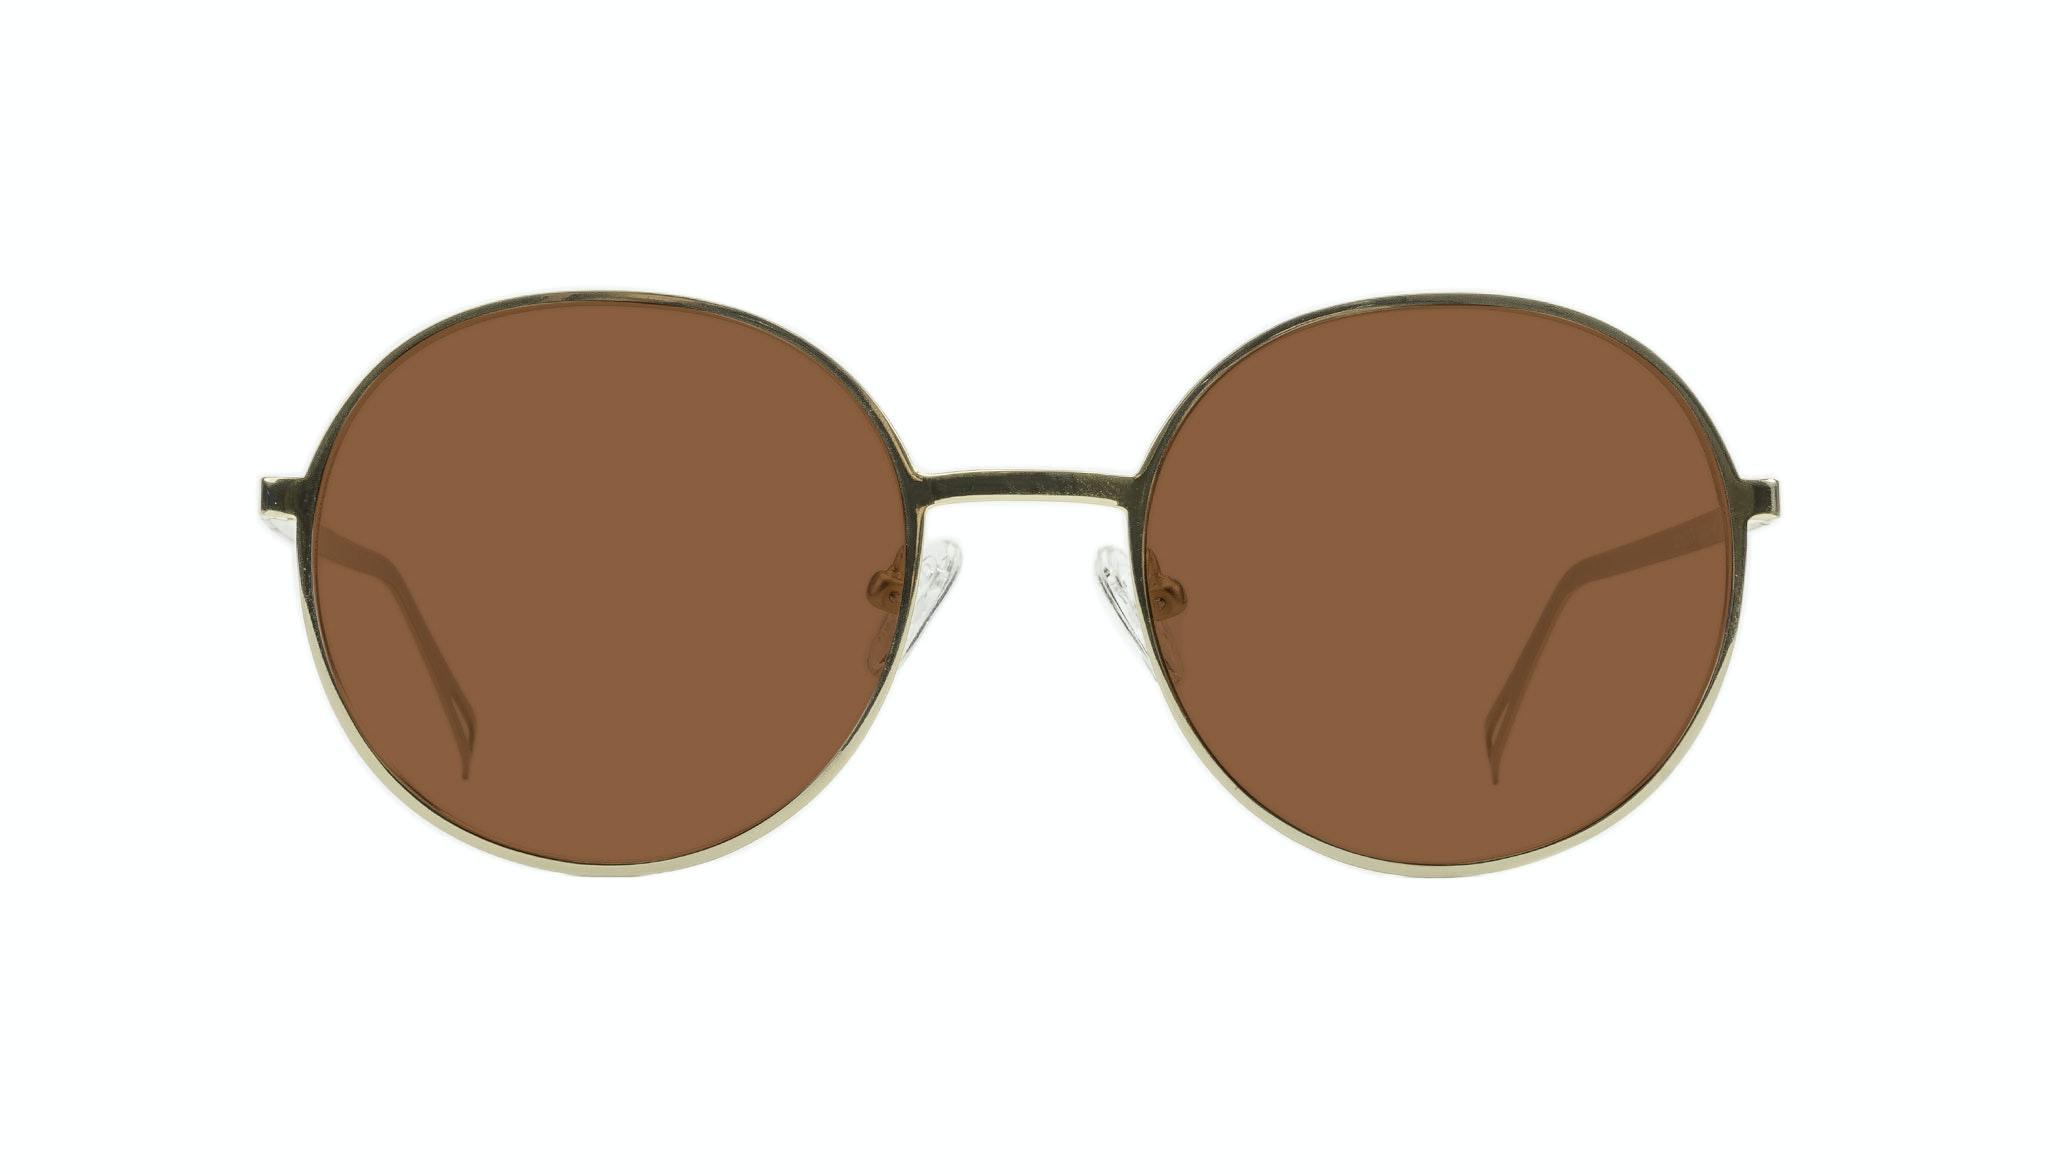 Affordable Fashion Glasses Round Sunglasses Men Women Varna Gold Front